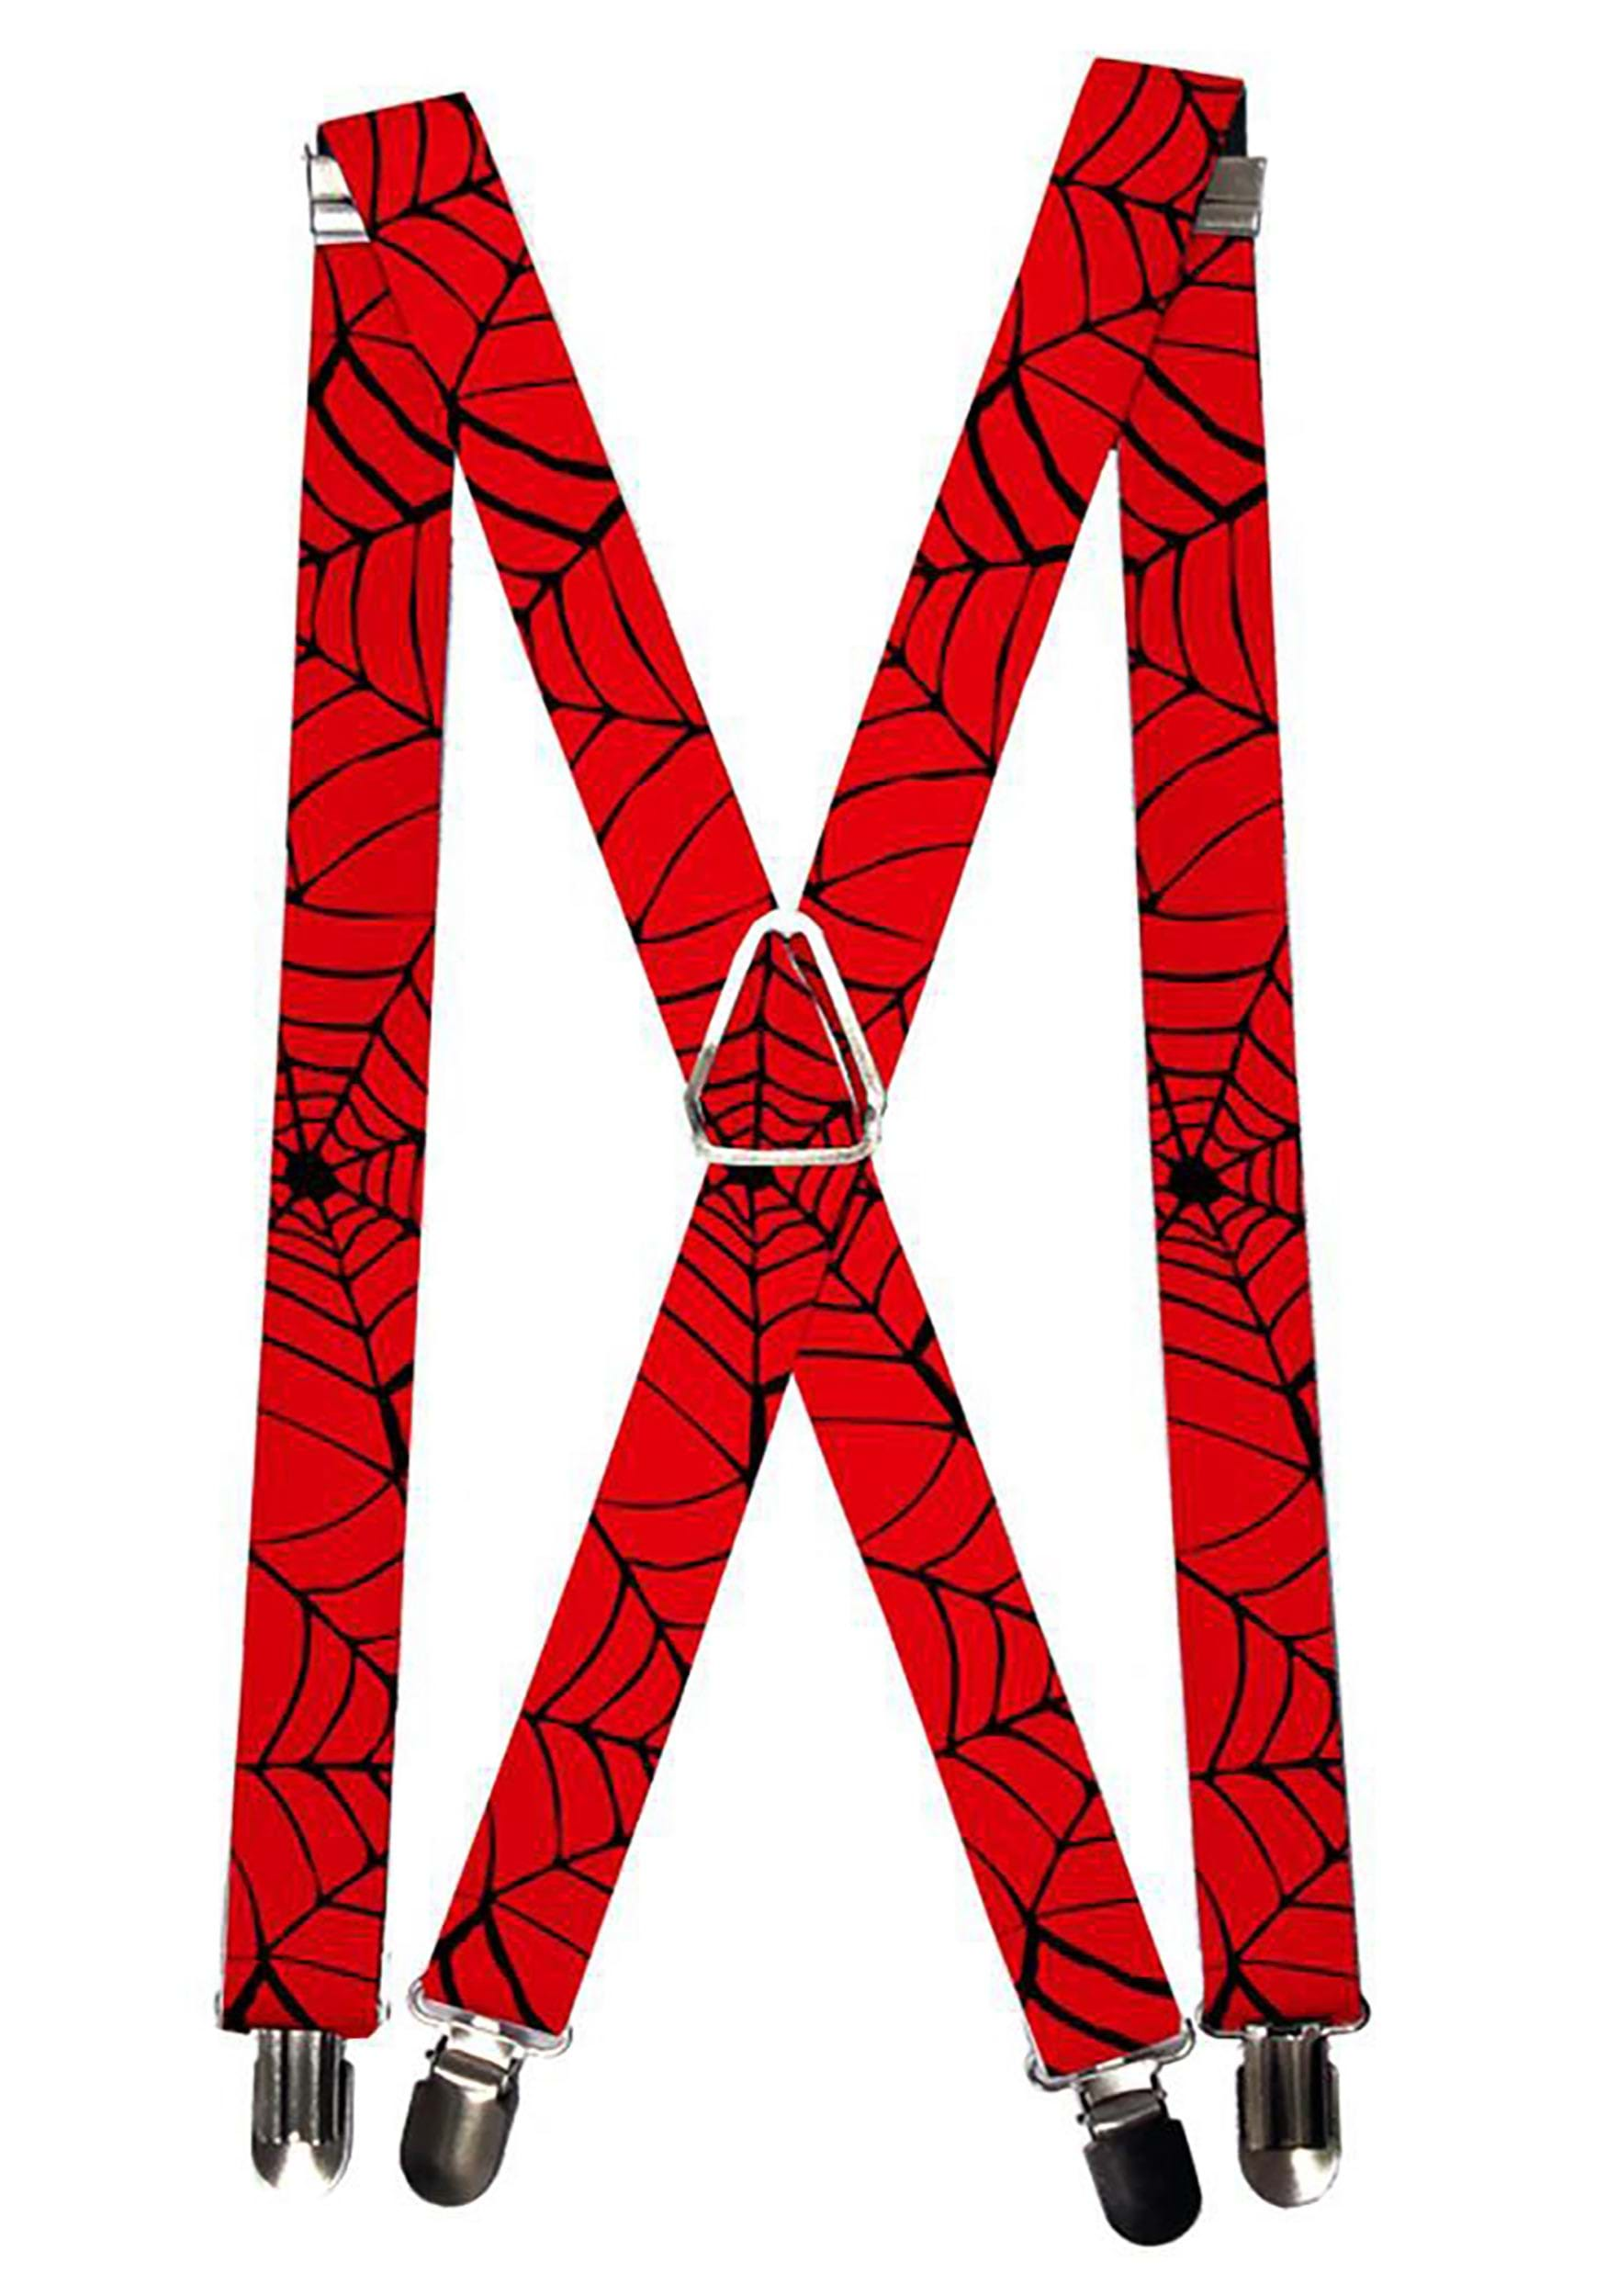 Marvel_Comics_Spiderman_Suspenders